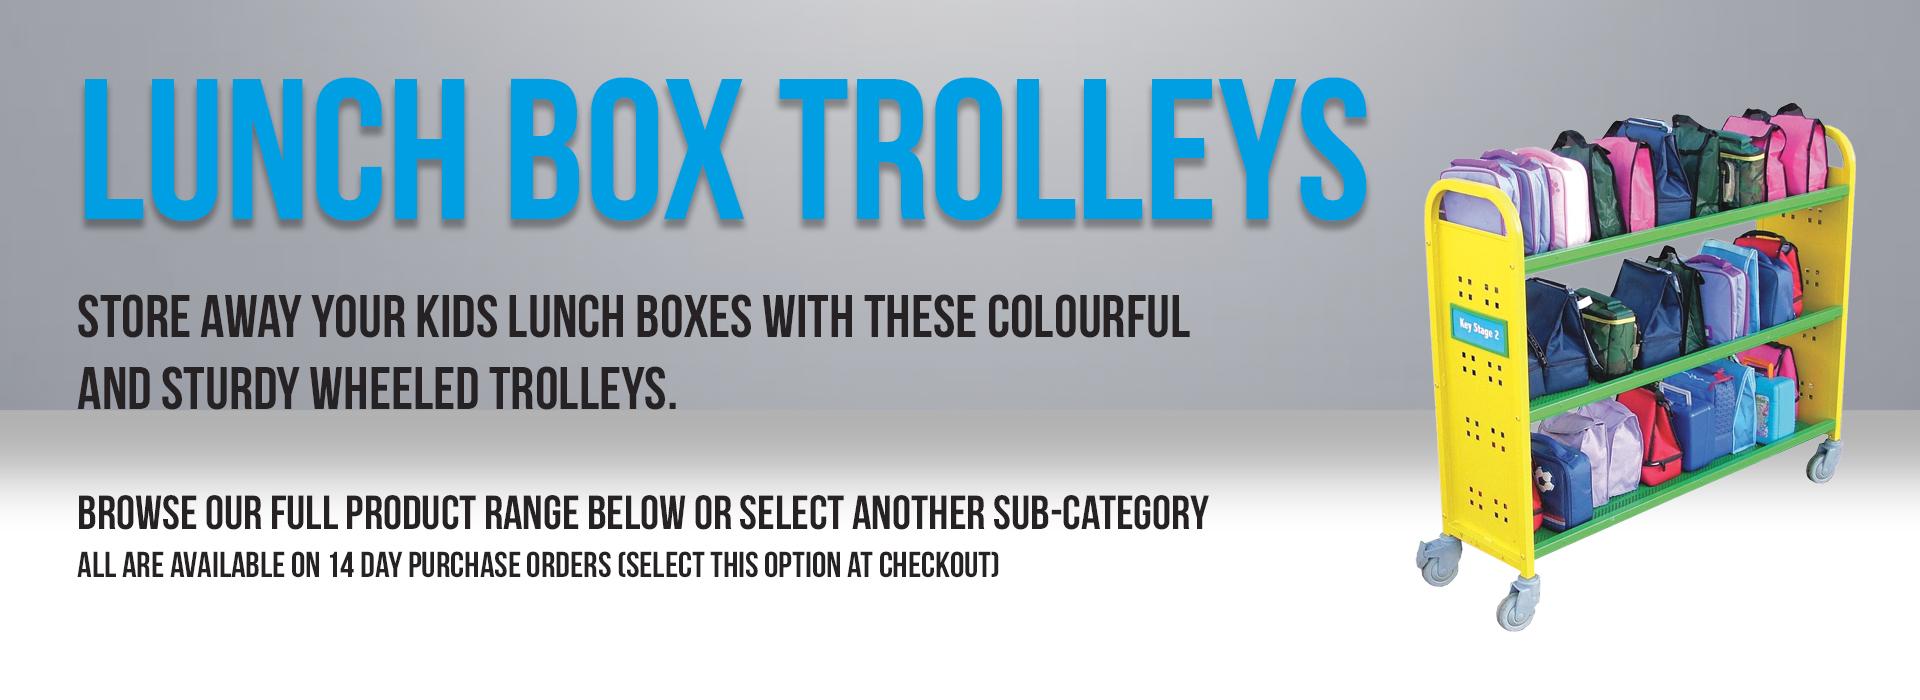 lunch-box-trolleys-banner.jpg